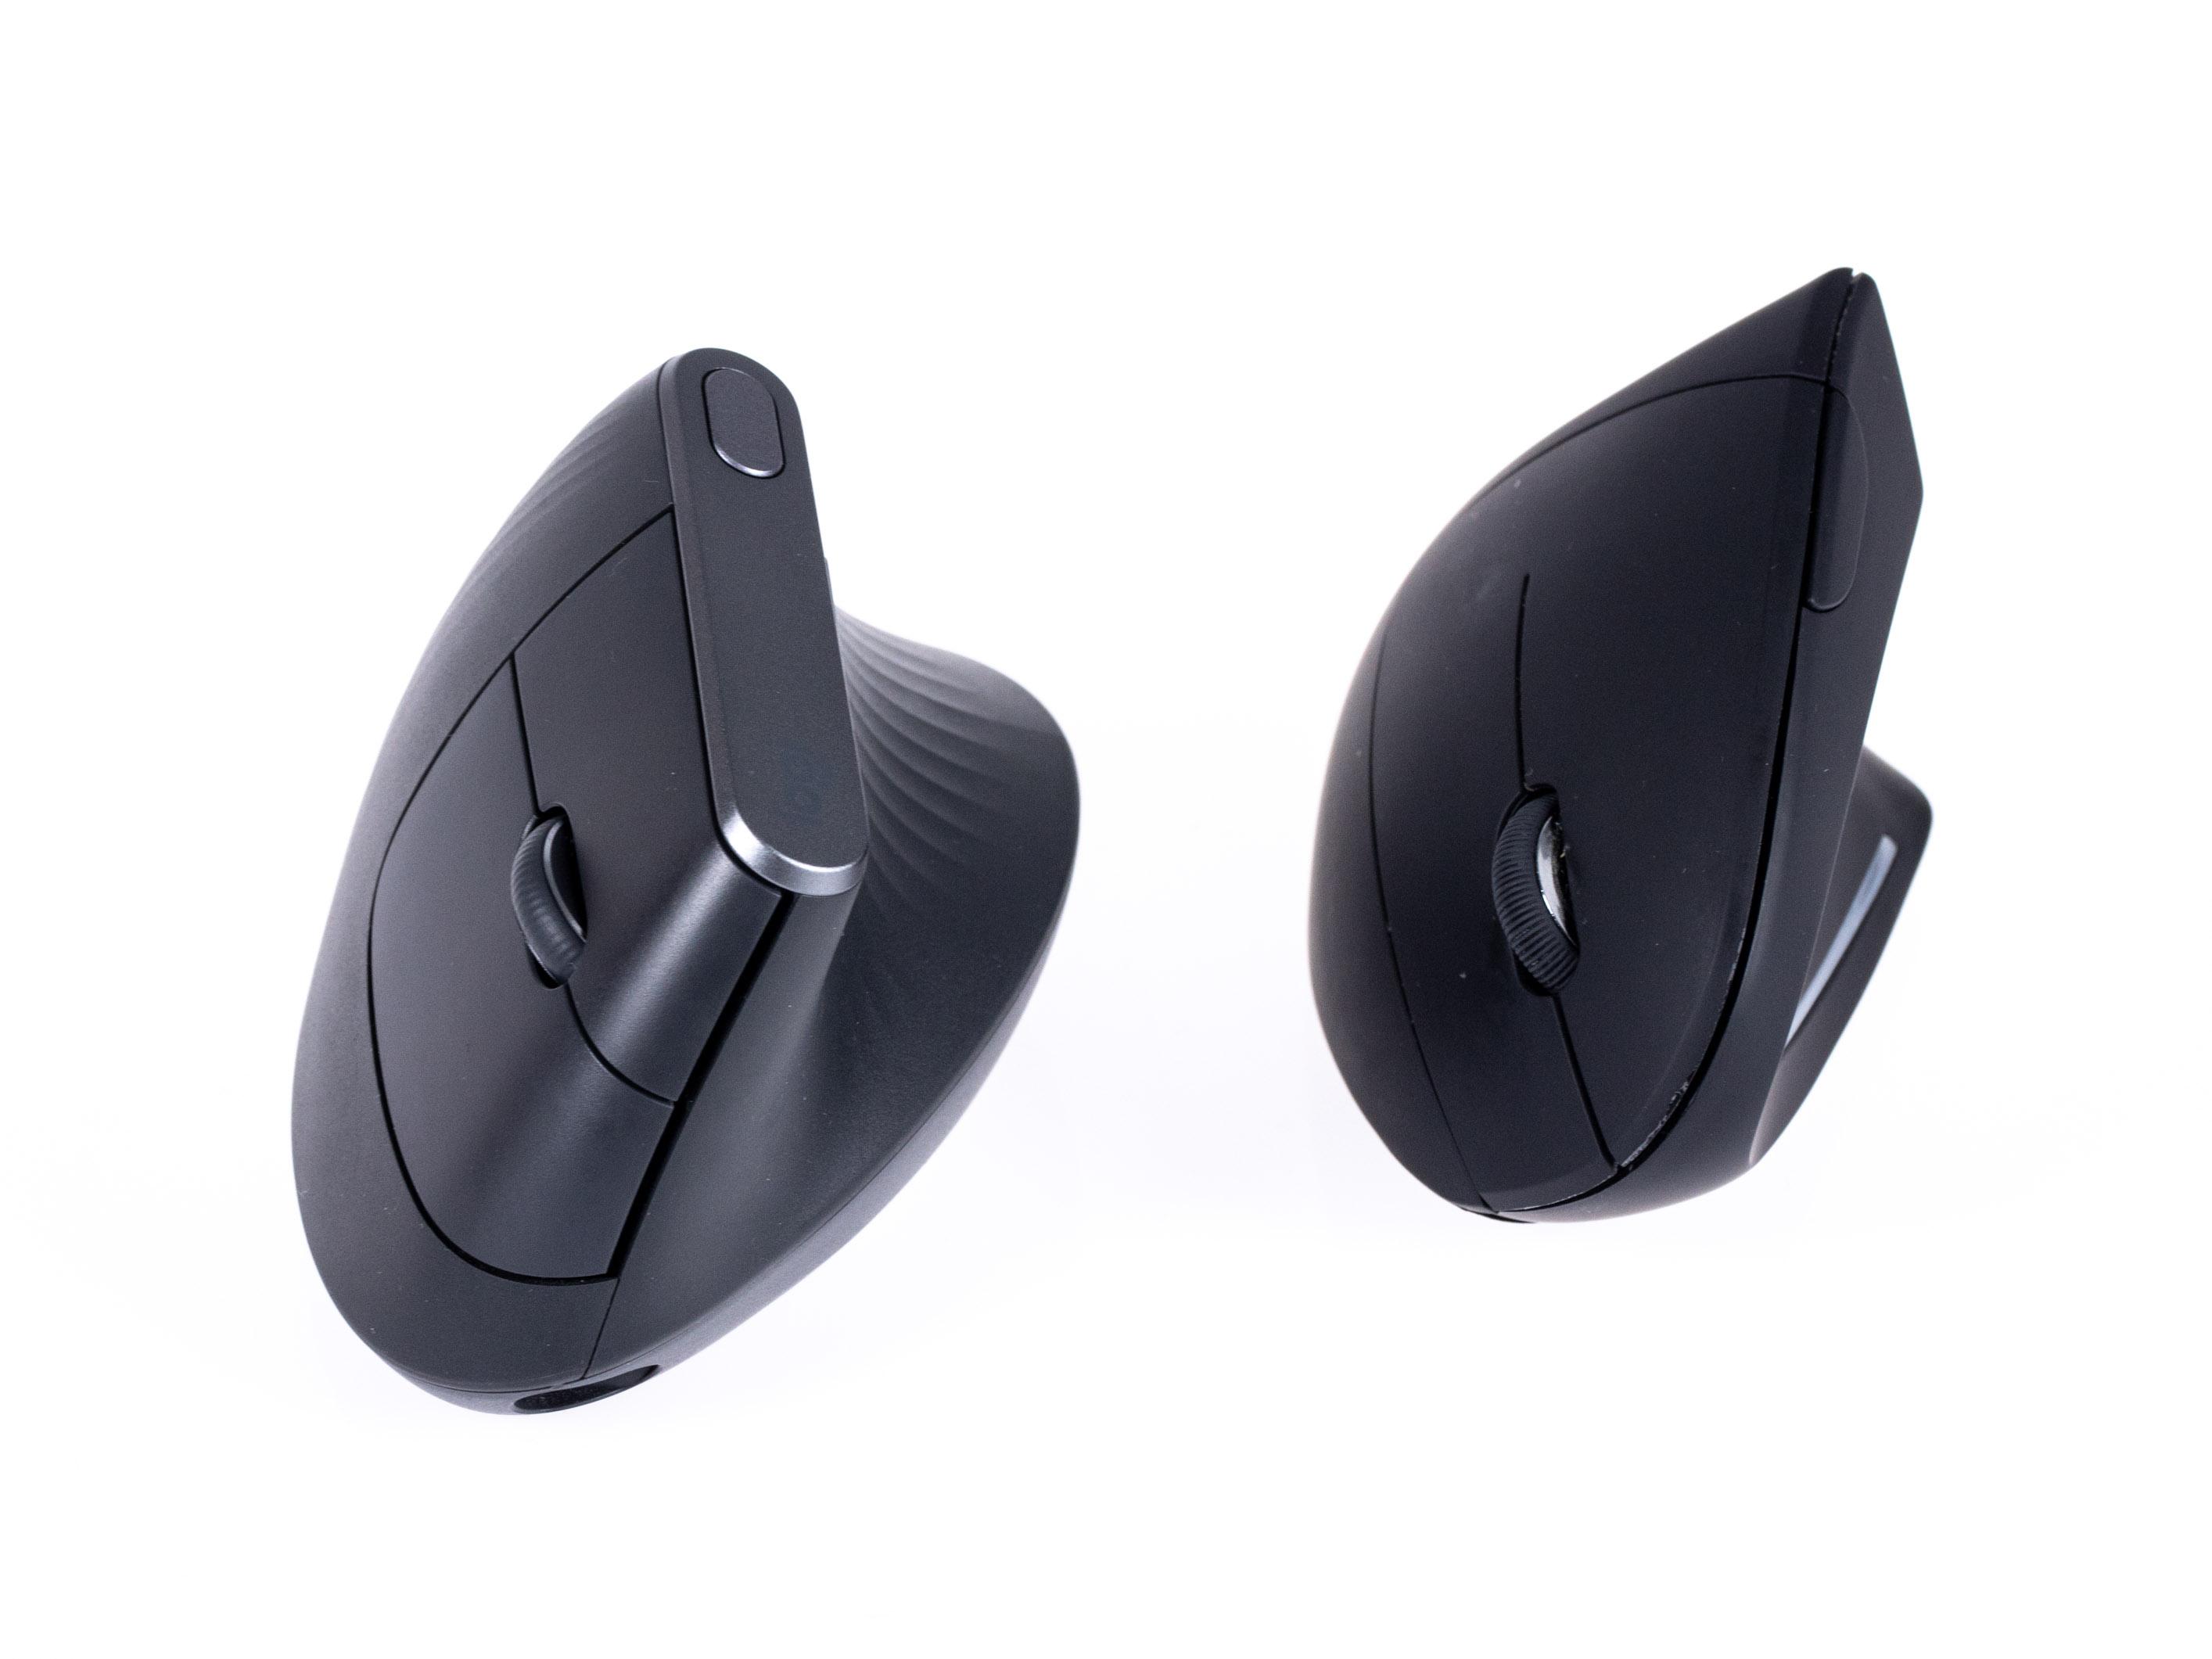 Logitechs MX Vertical im Test: So teuer muss eine gute vertikale Maus nicht sein - Logitechs MX Vertical (l.), Ankers vertikale Maus (r.) (Bild: Martin Wolf/Golem.de)